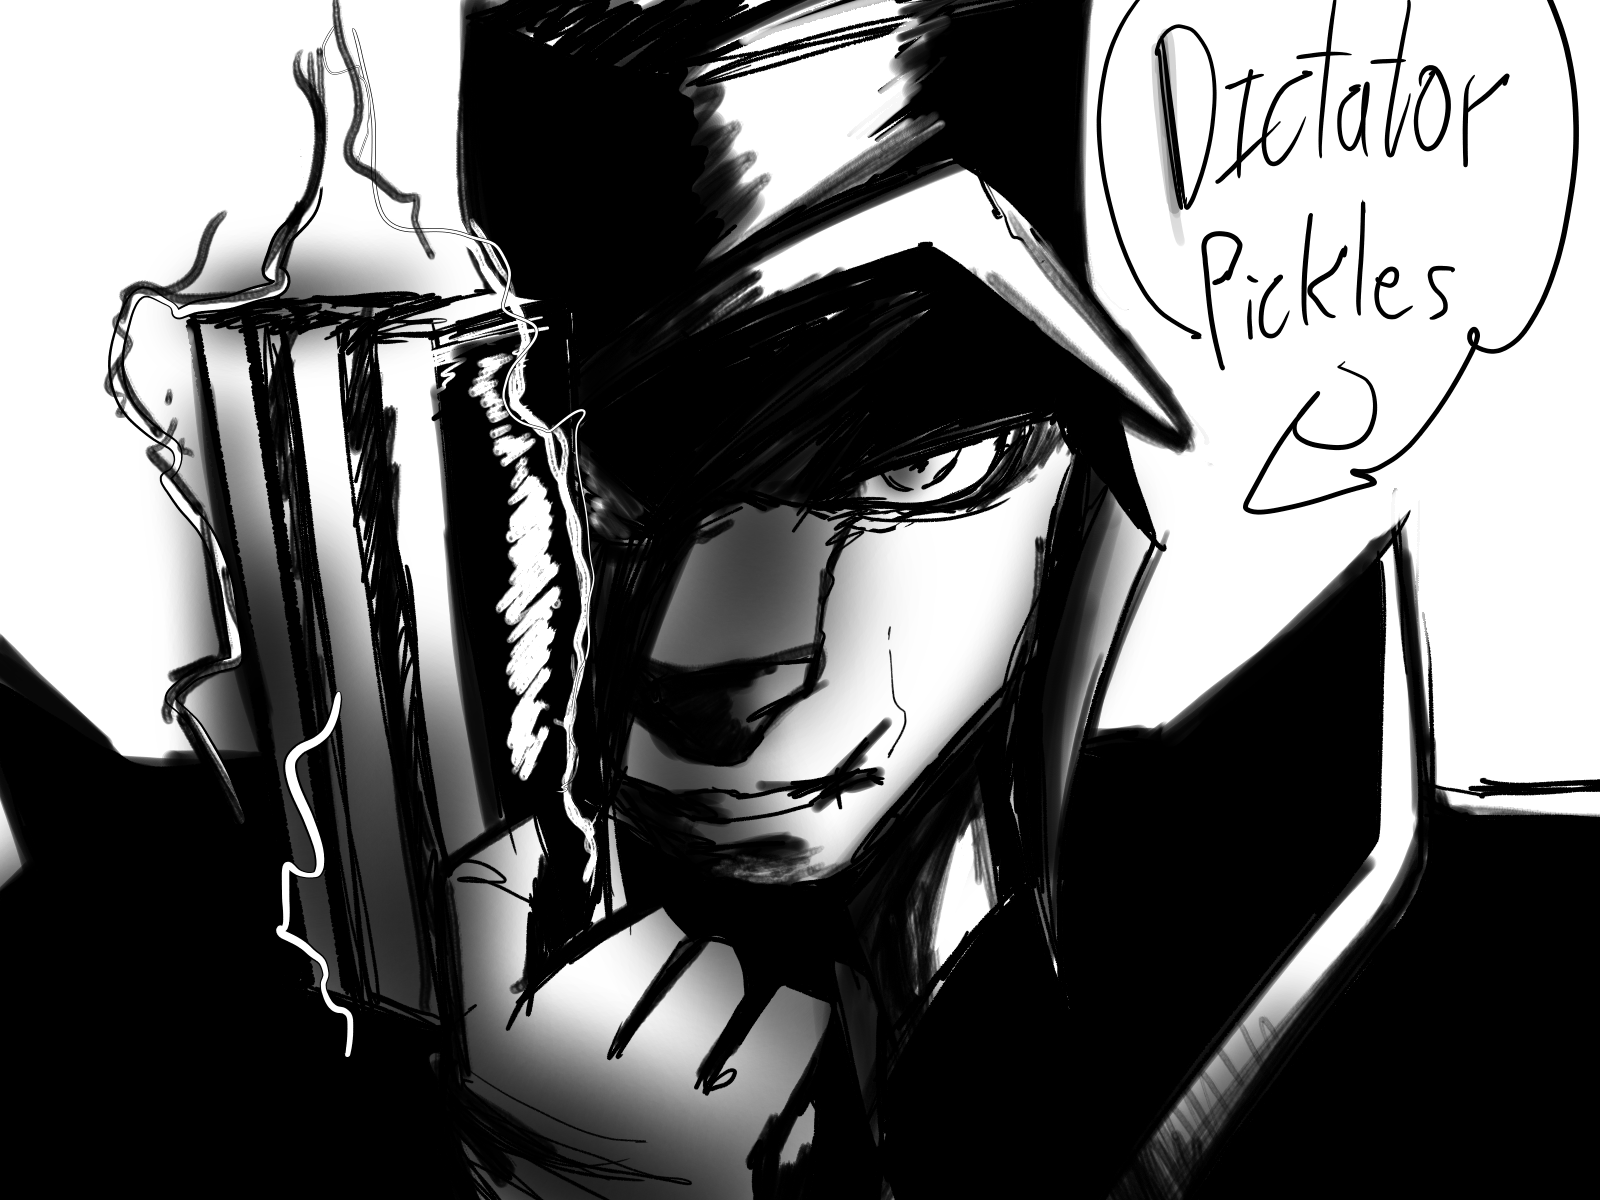 Dictator Pickles 30 09 2016